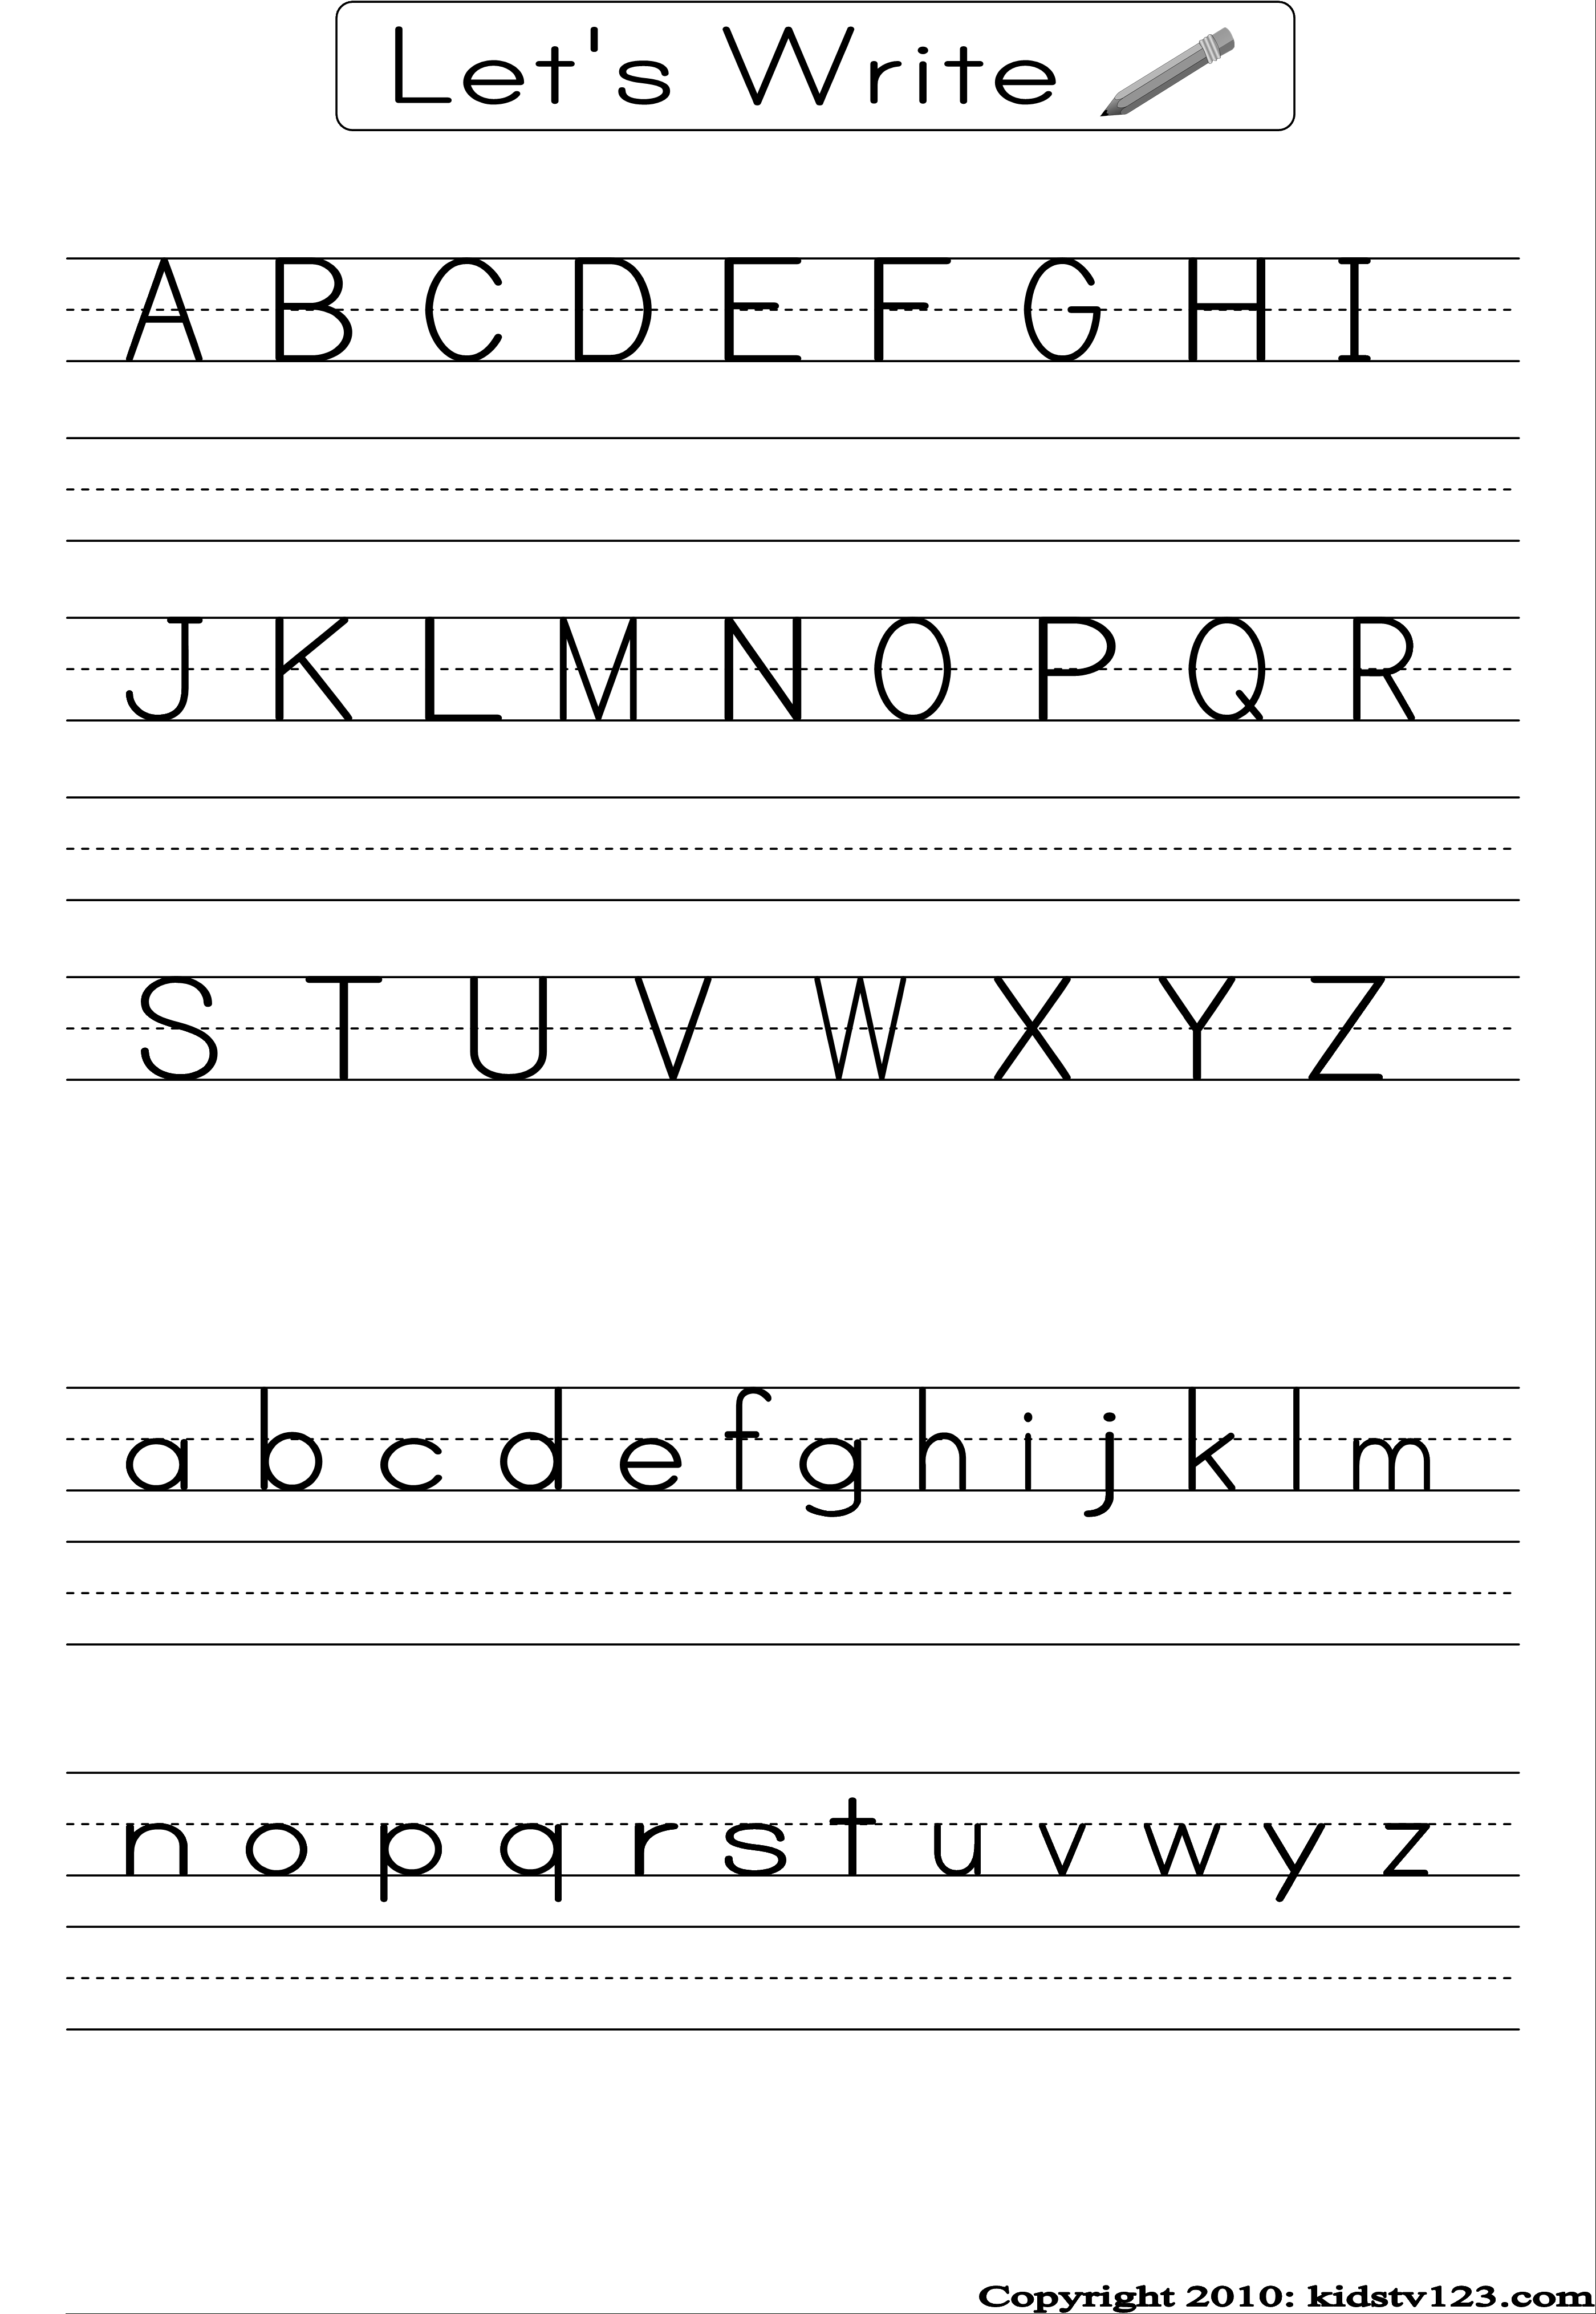 Alphabet Writing Practice Sheet | Edu-Fun | Alphabet Worksheets | Printable Alphabet Worksheets